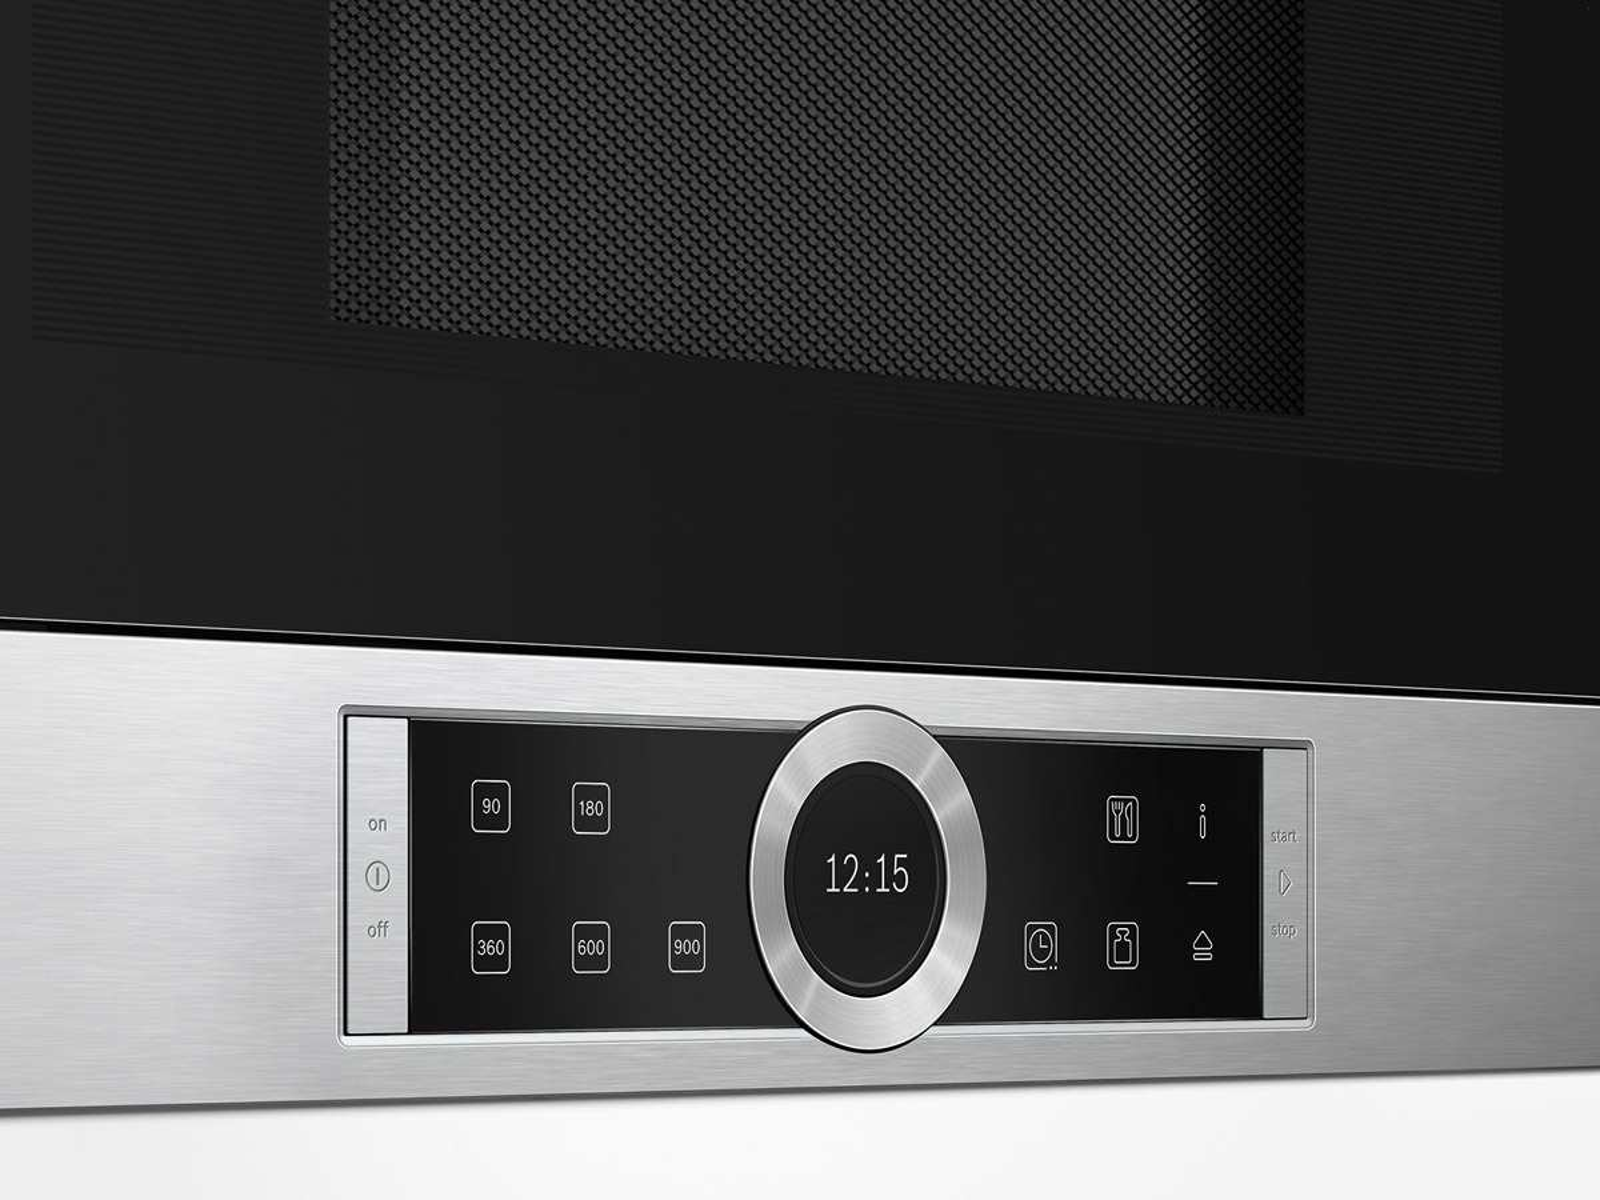 bosch bfl634gs1 einbau mikrowelle edelstahl. Black Bedroom Furniture Sets. Home Design Ideas